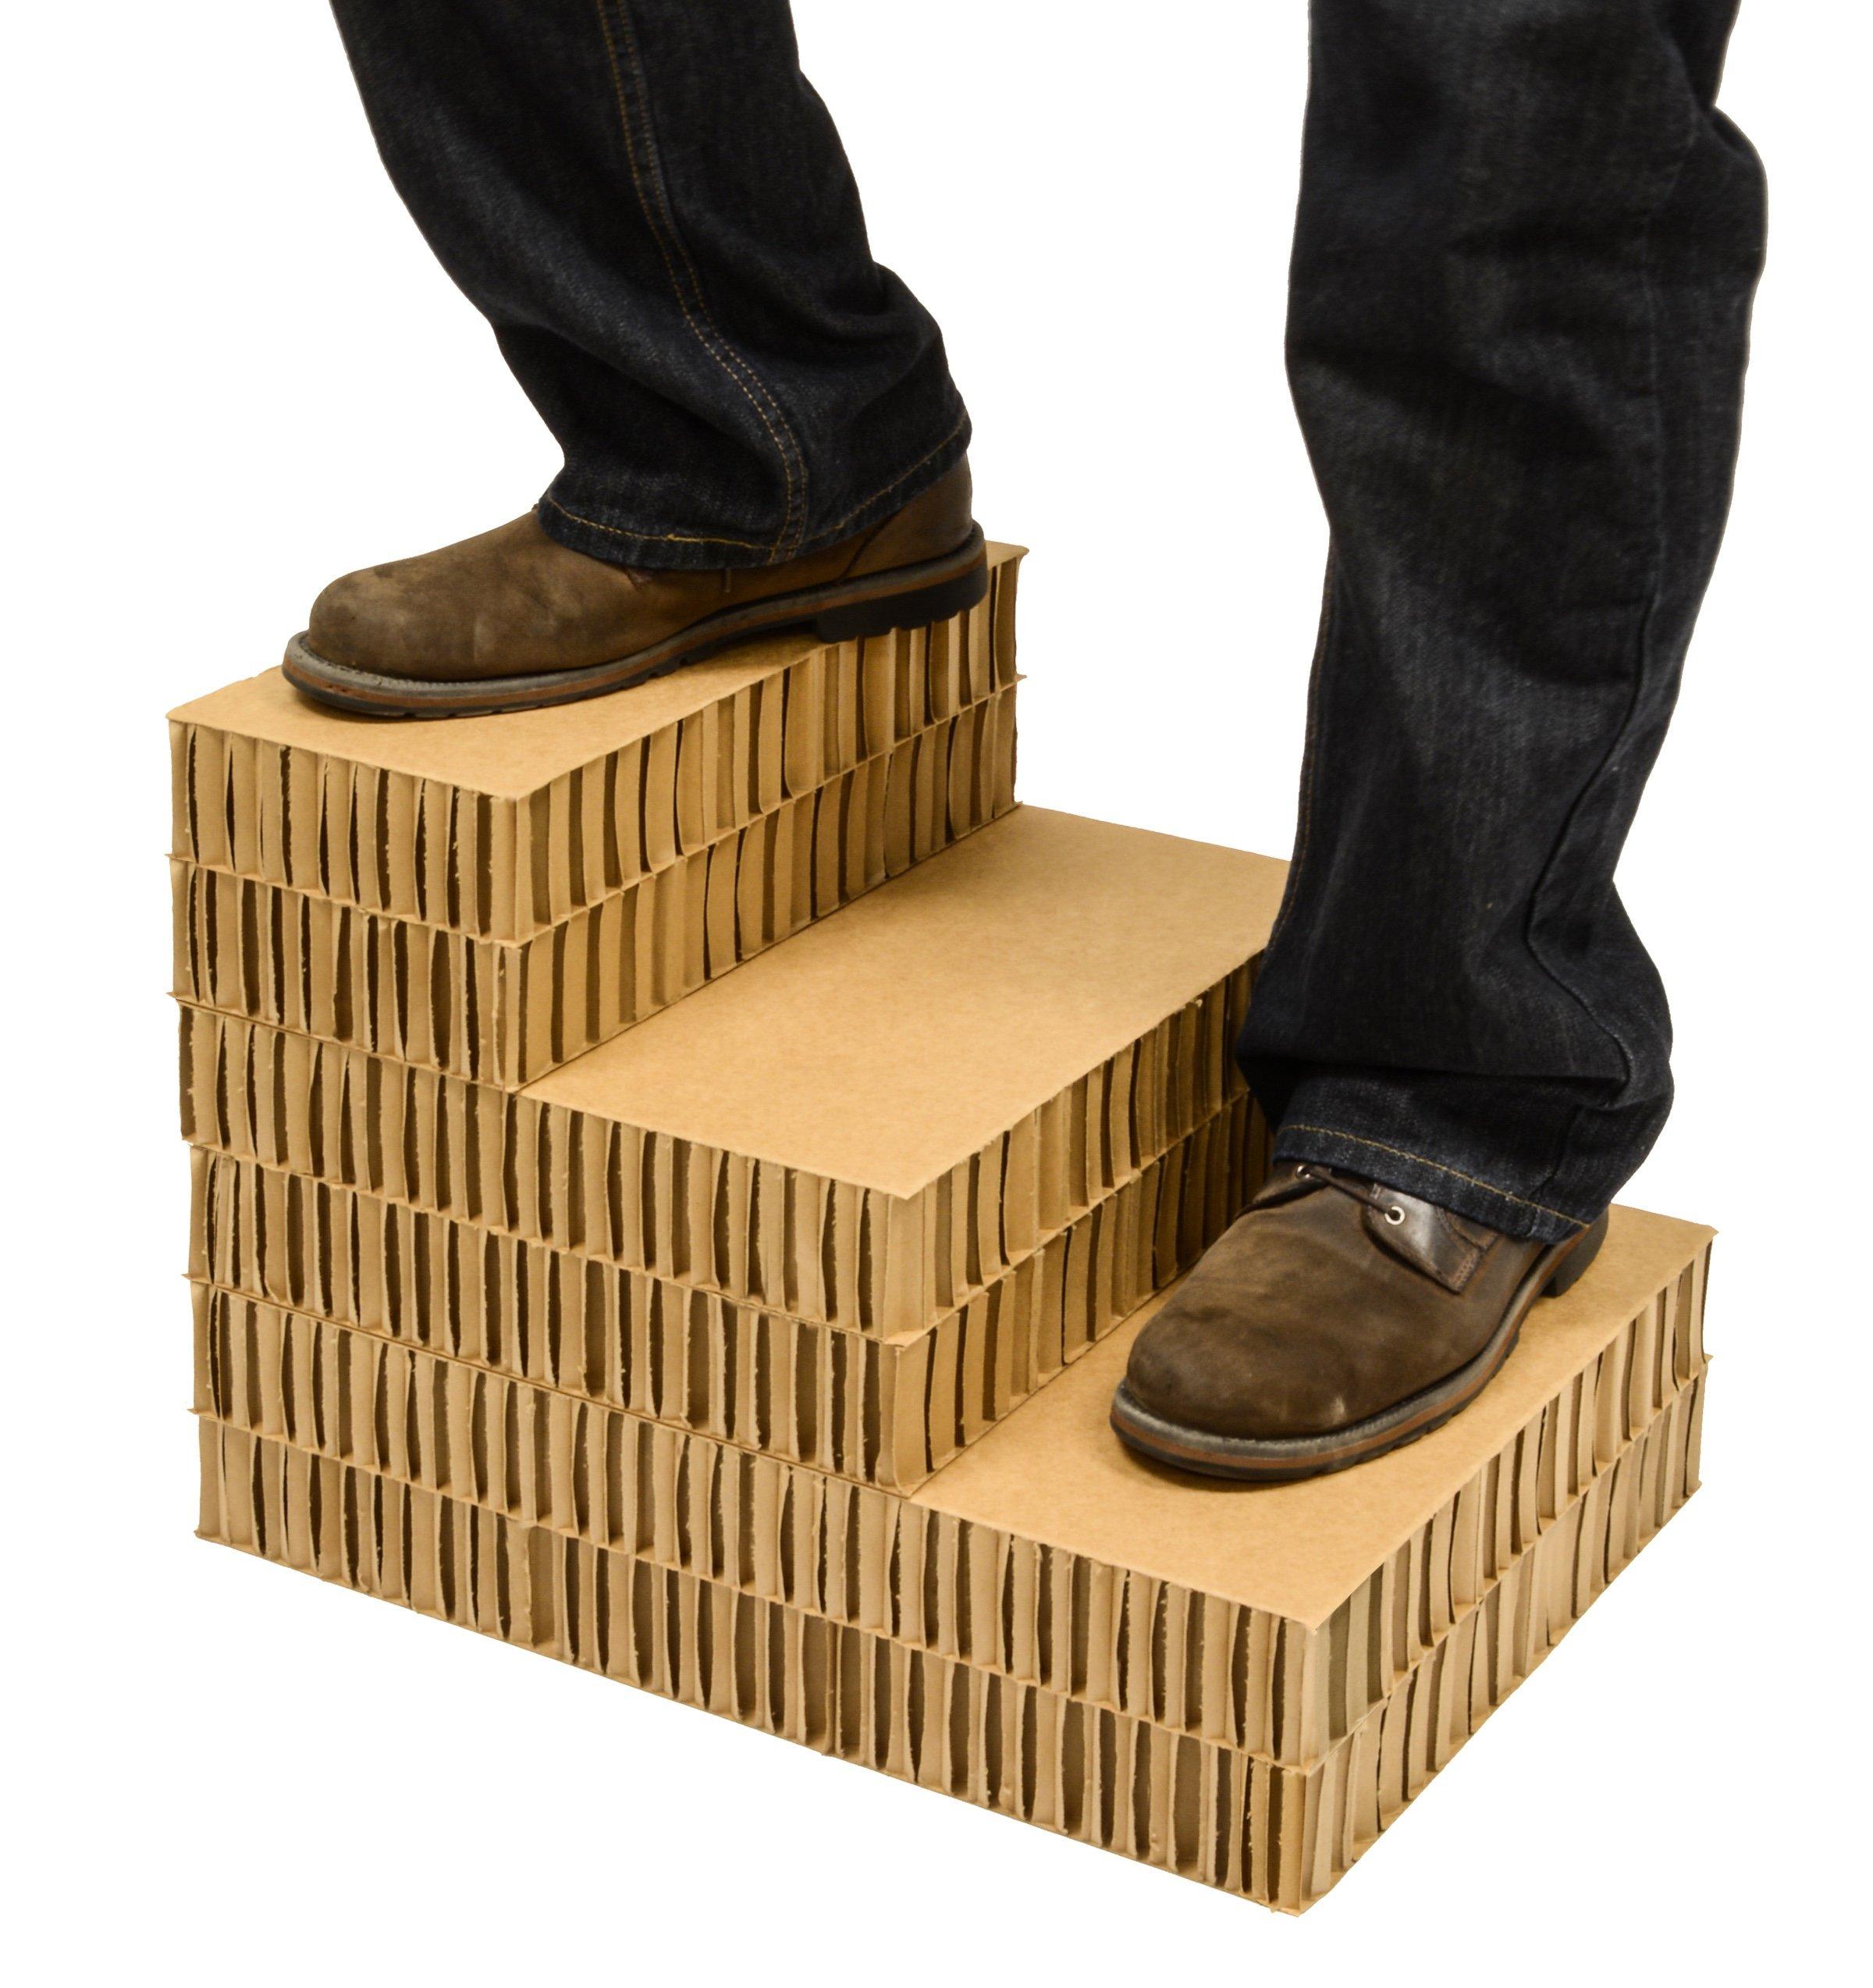 Dallas Manufacturing Co. 3 Step Home Décor Pet Steps, Brown & Tan by Dallas Manufacturing Co. (Image #3)